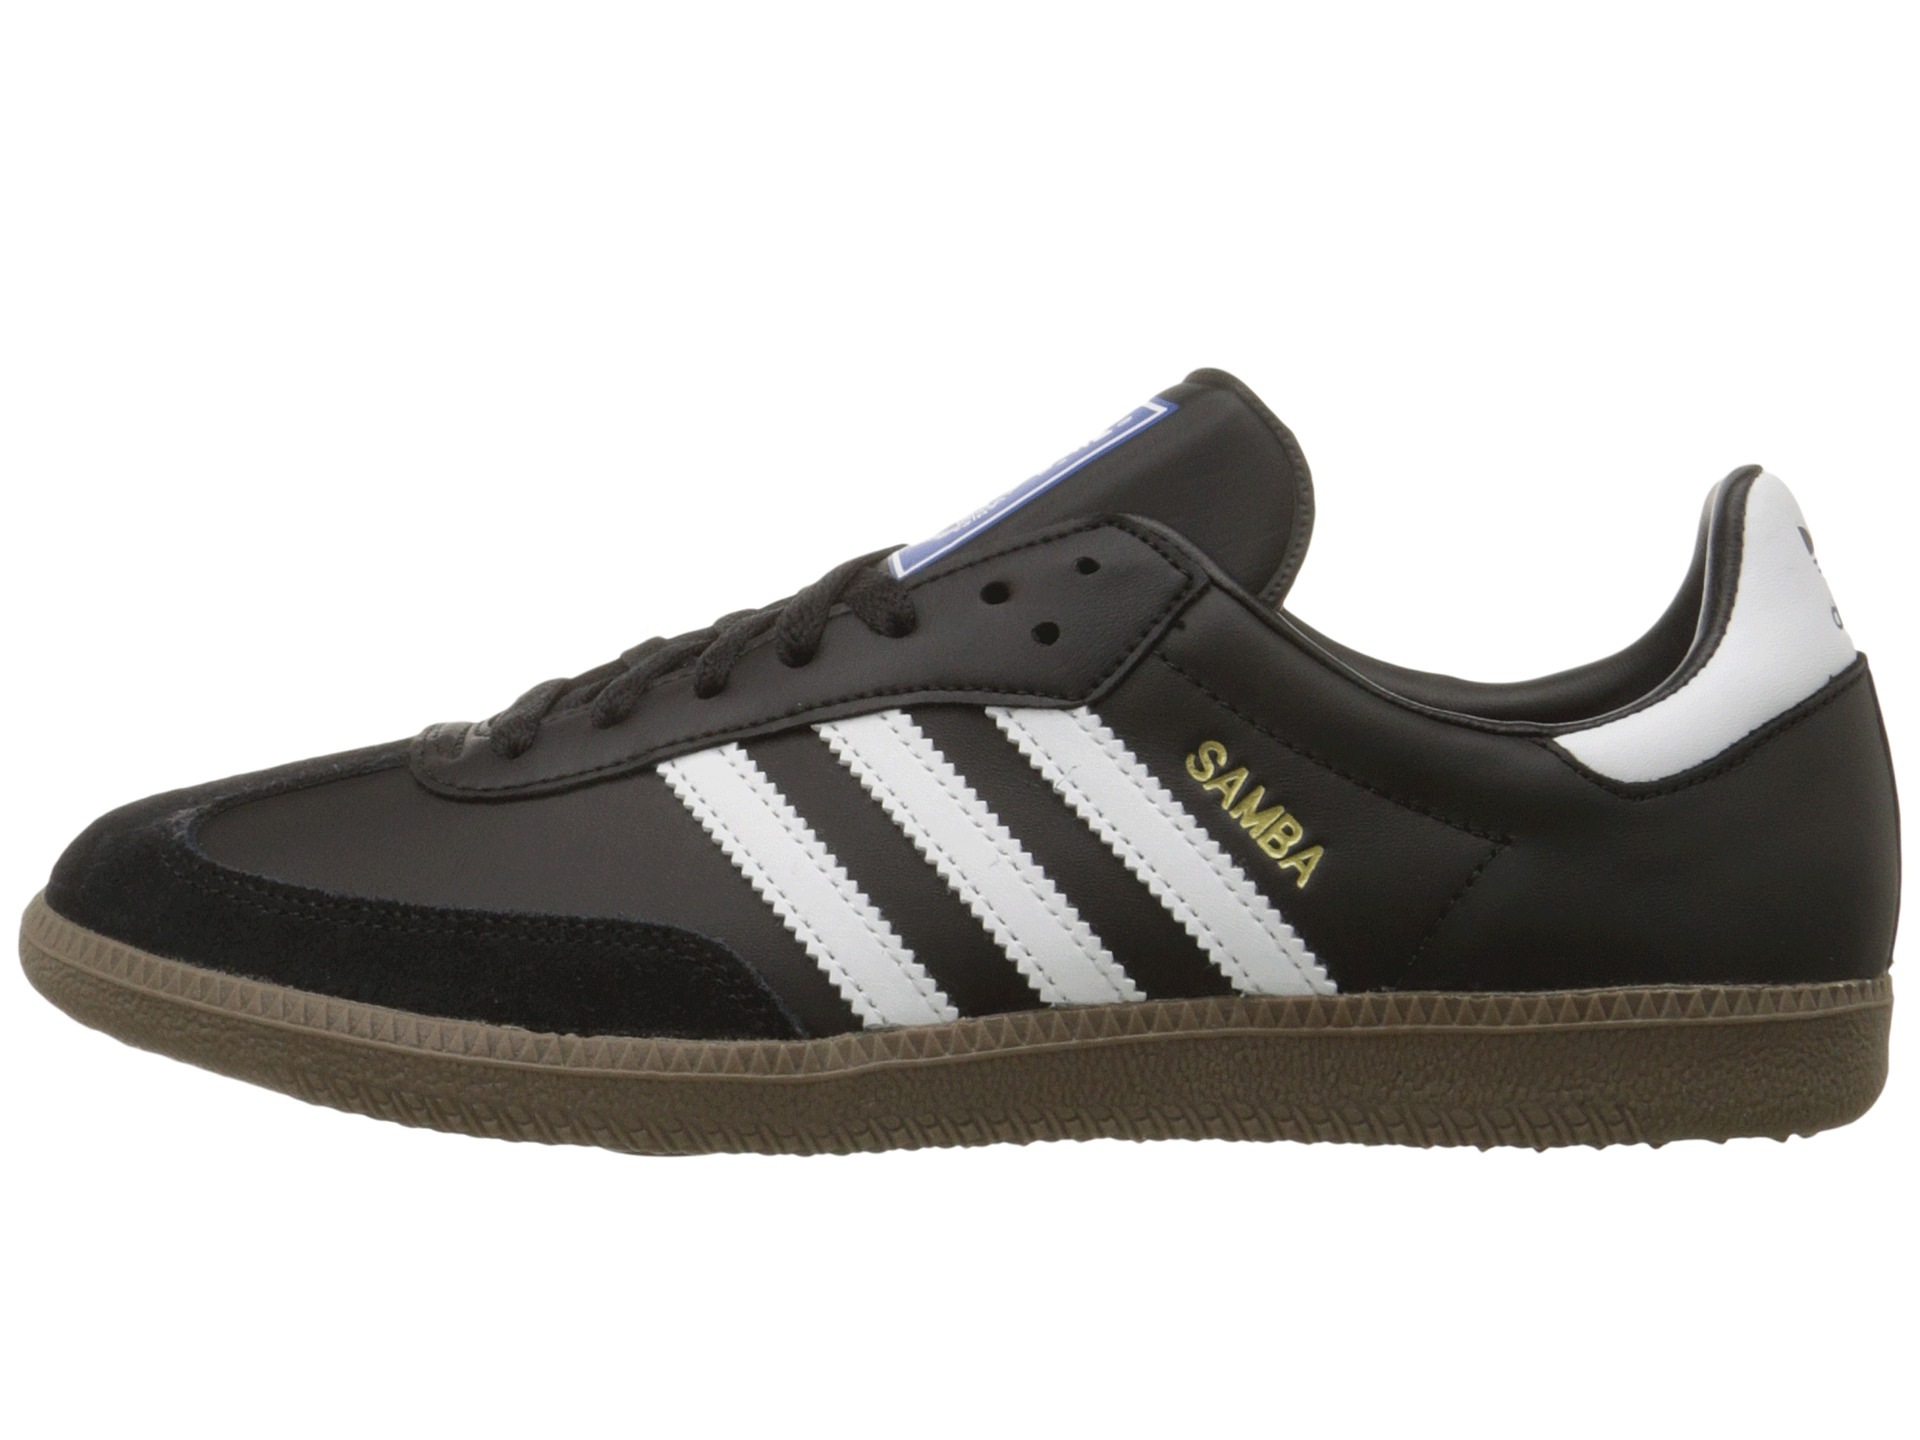 Adidas Shoes Zappos